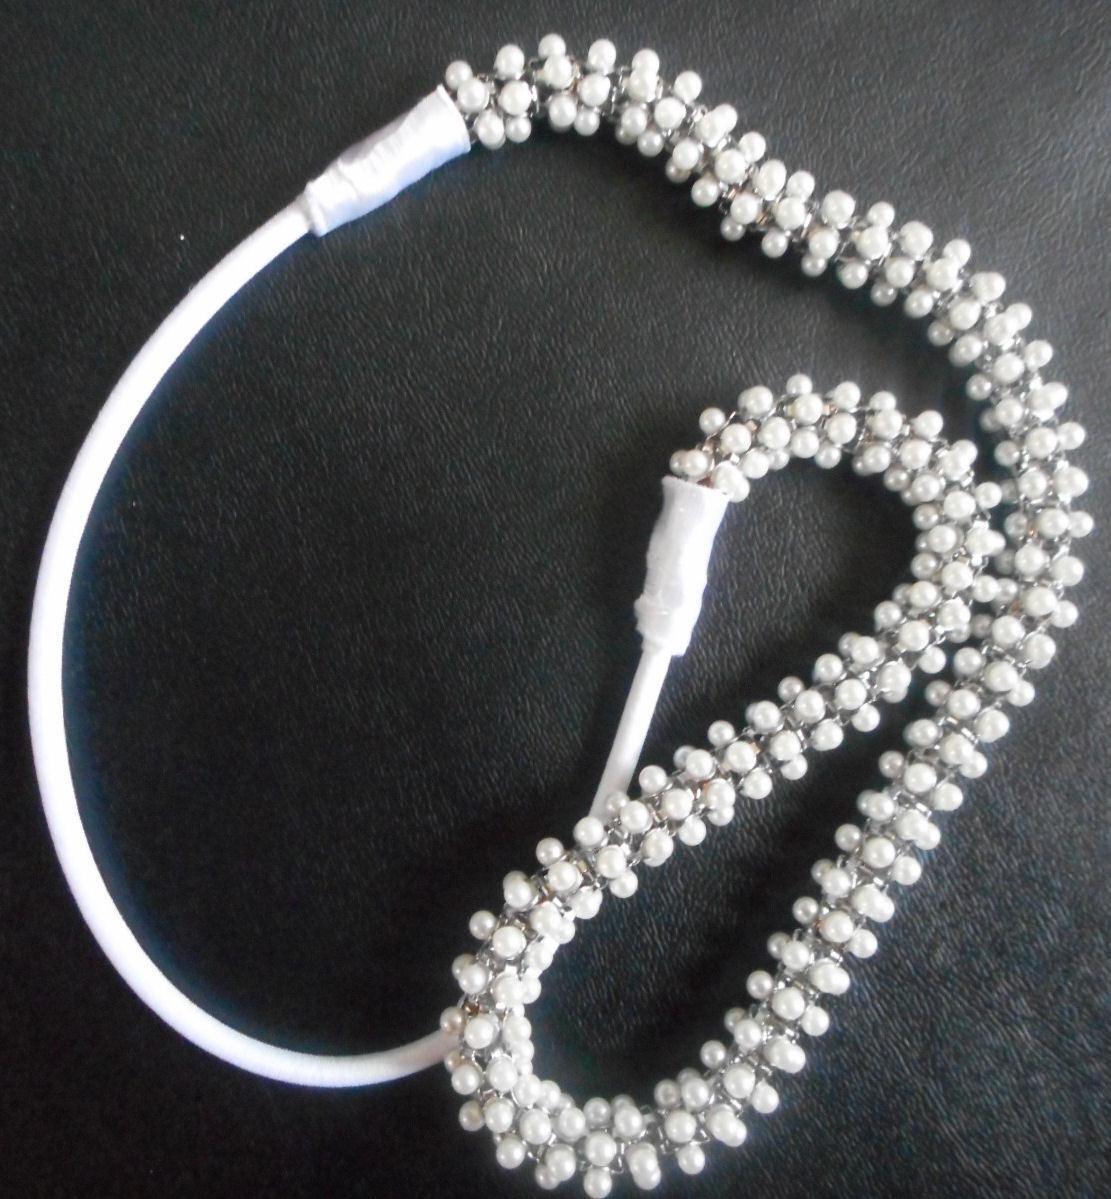 HAPACHICO LUPITA Vintage Soft Hair Headband White Pearls Beads Silver